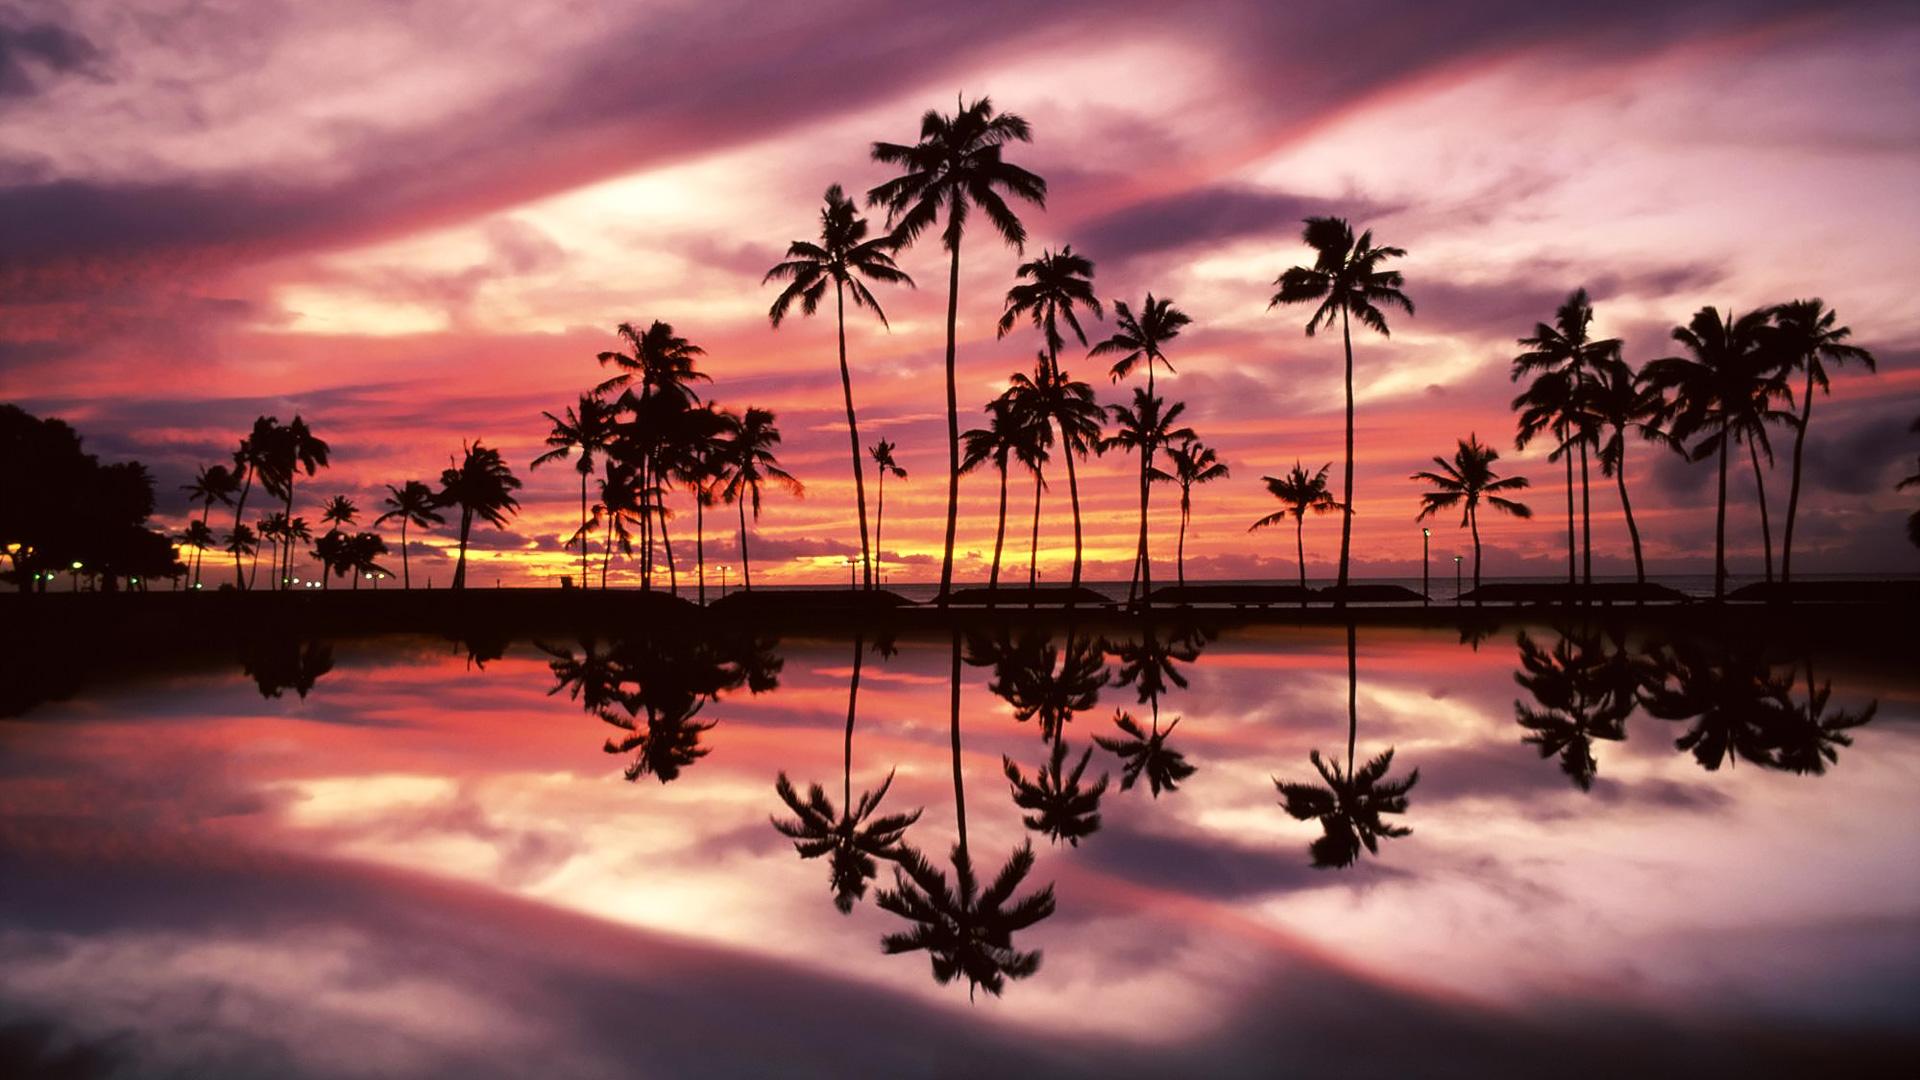 hawaii beach night #2